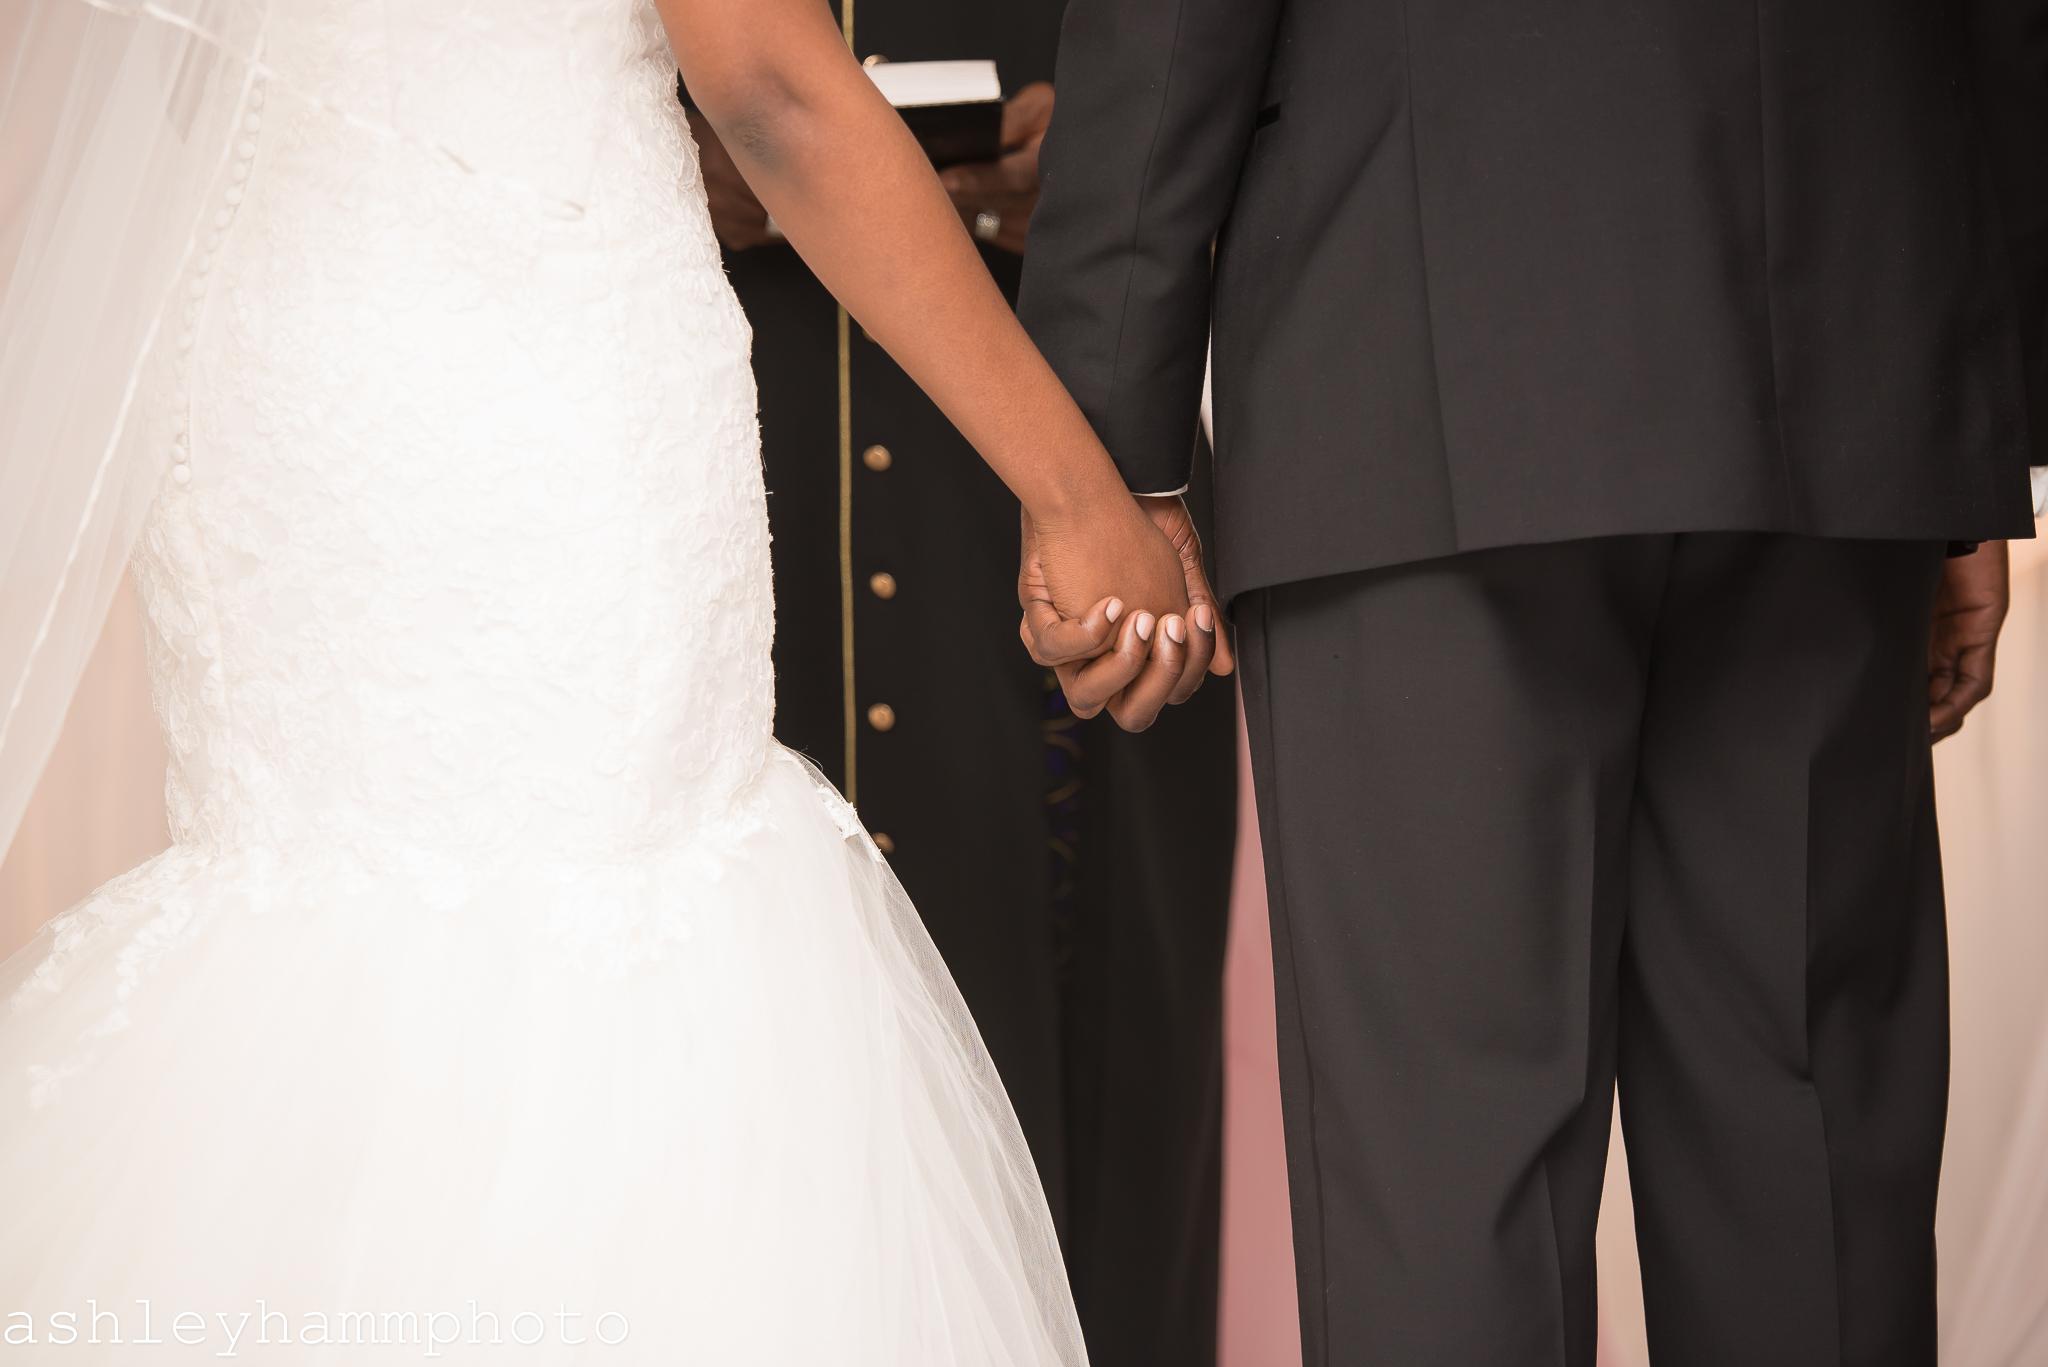 Chciago-Wedding-Vow-Exchange-03